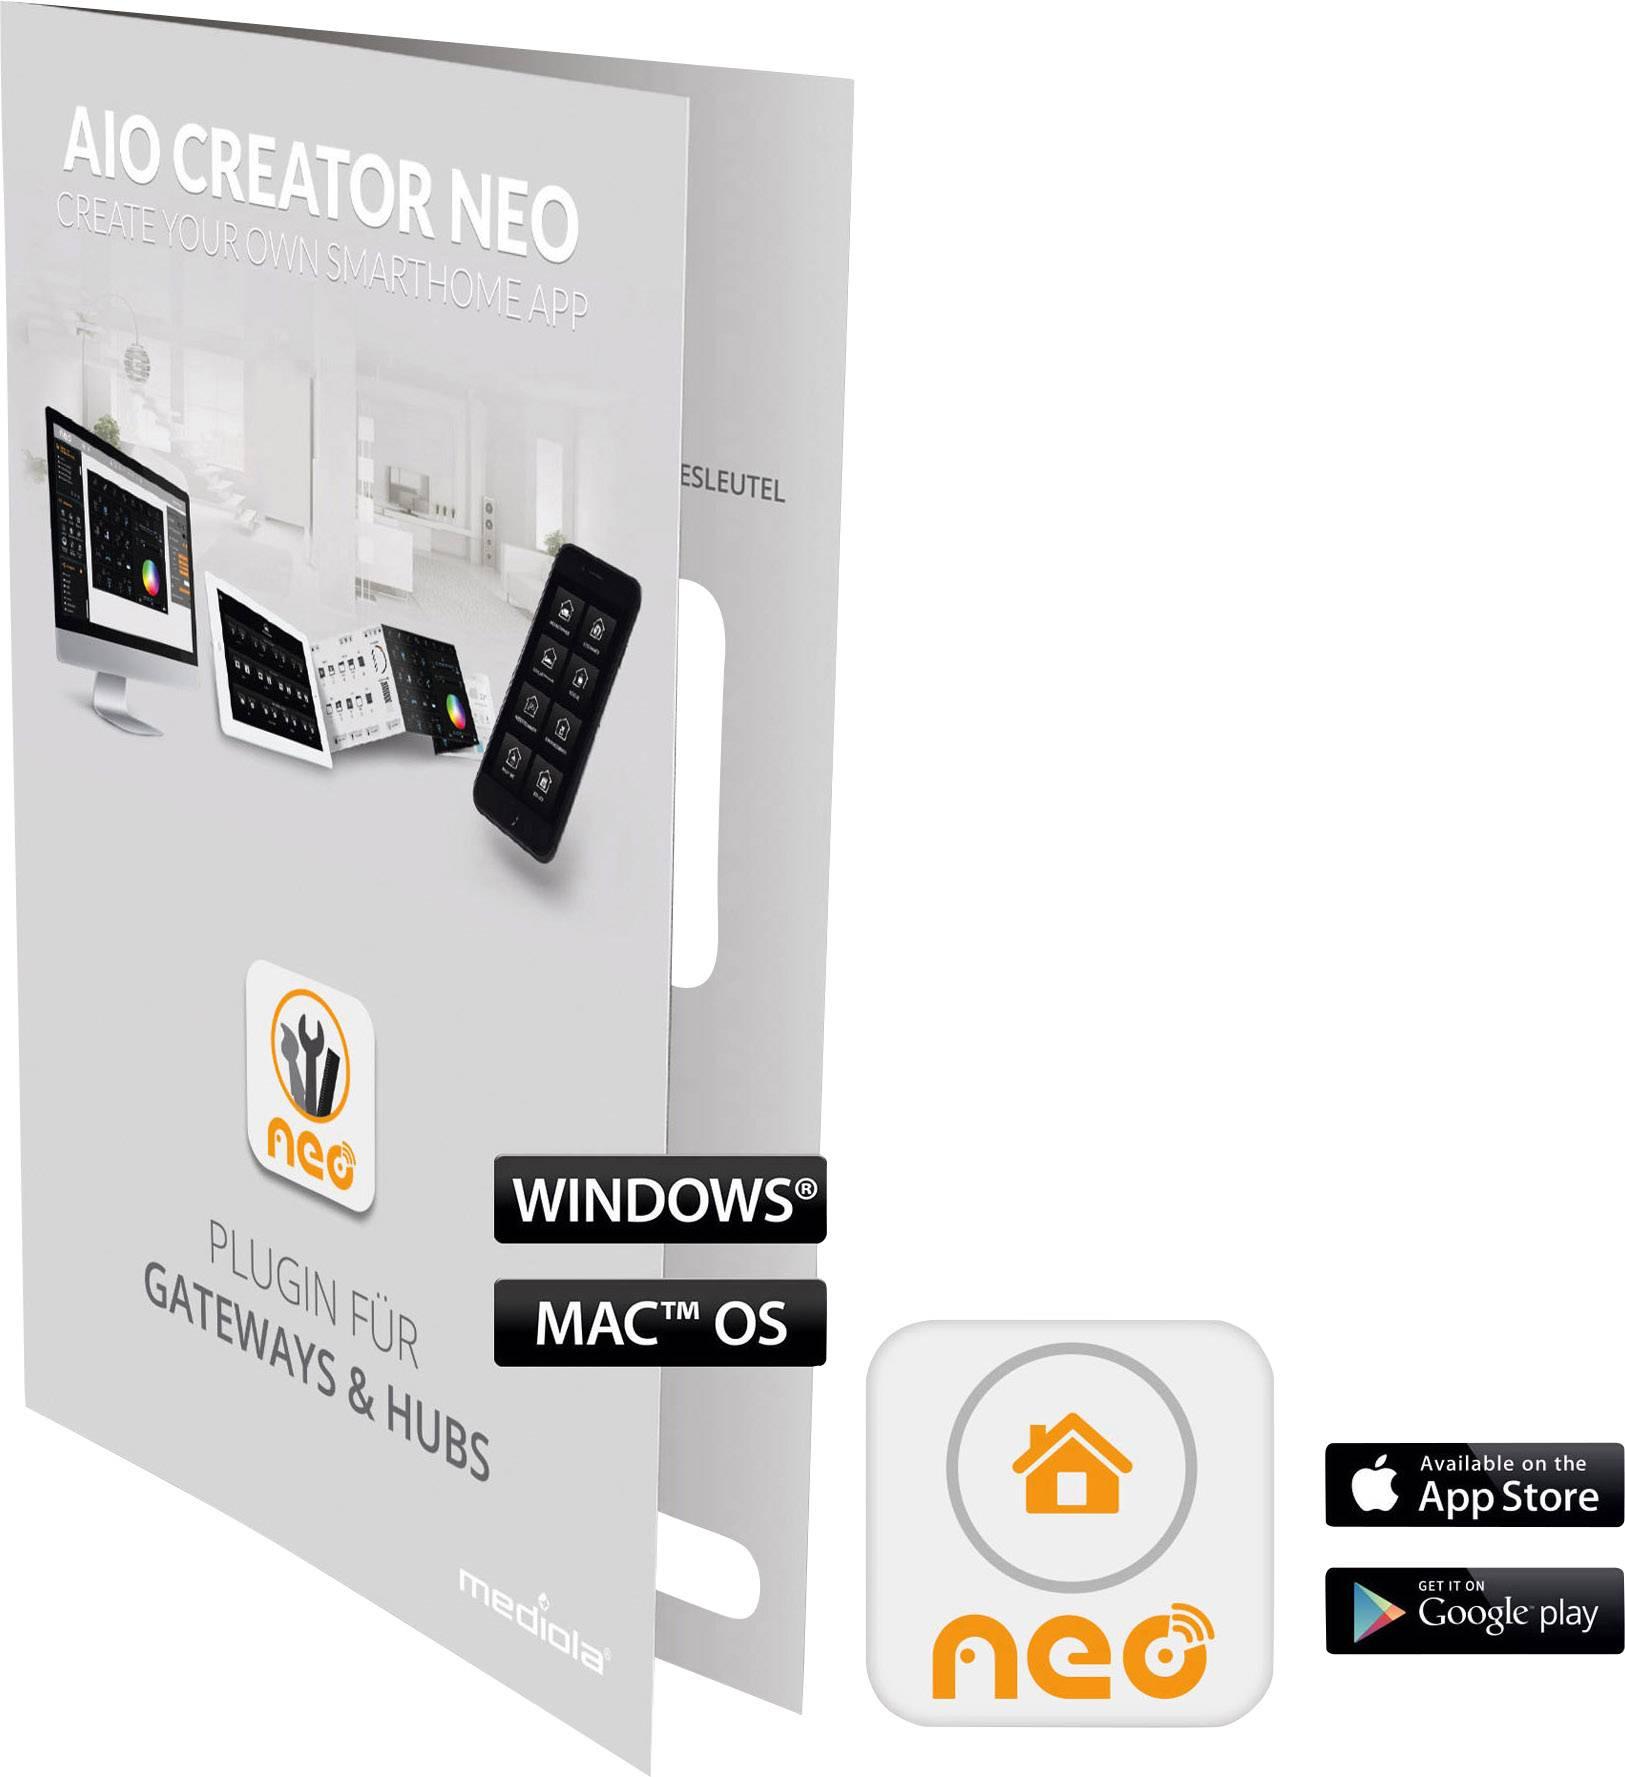 Doplňujúci software Mediola SUM-4142-b AIO CREATOR NEO Homewizard